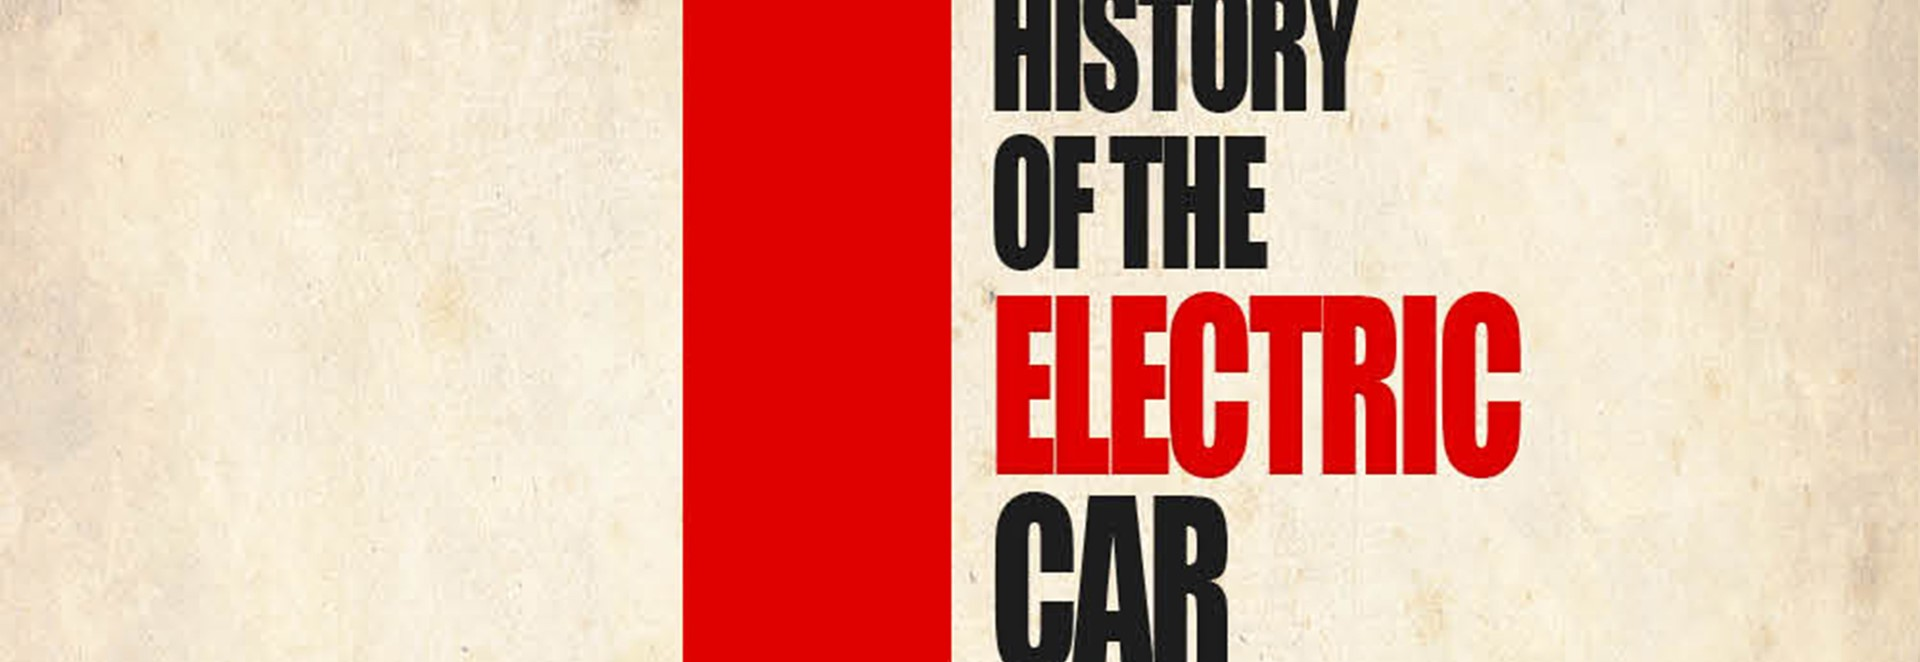 the history of the electric car car keys. Black Bedroom Furniture Sets. Home Design Ideas